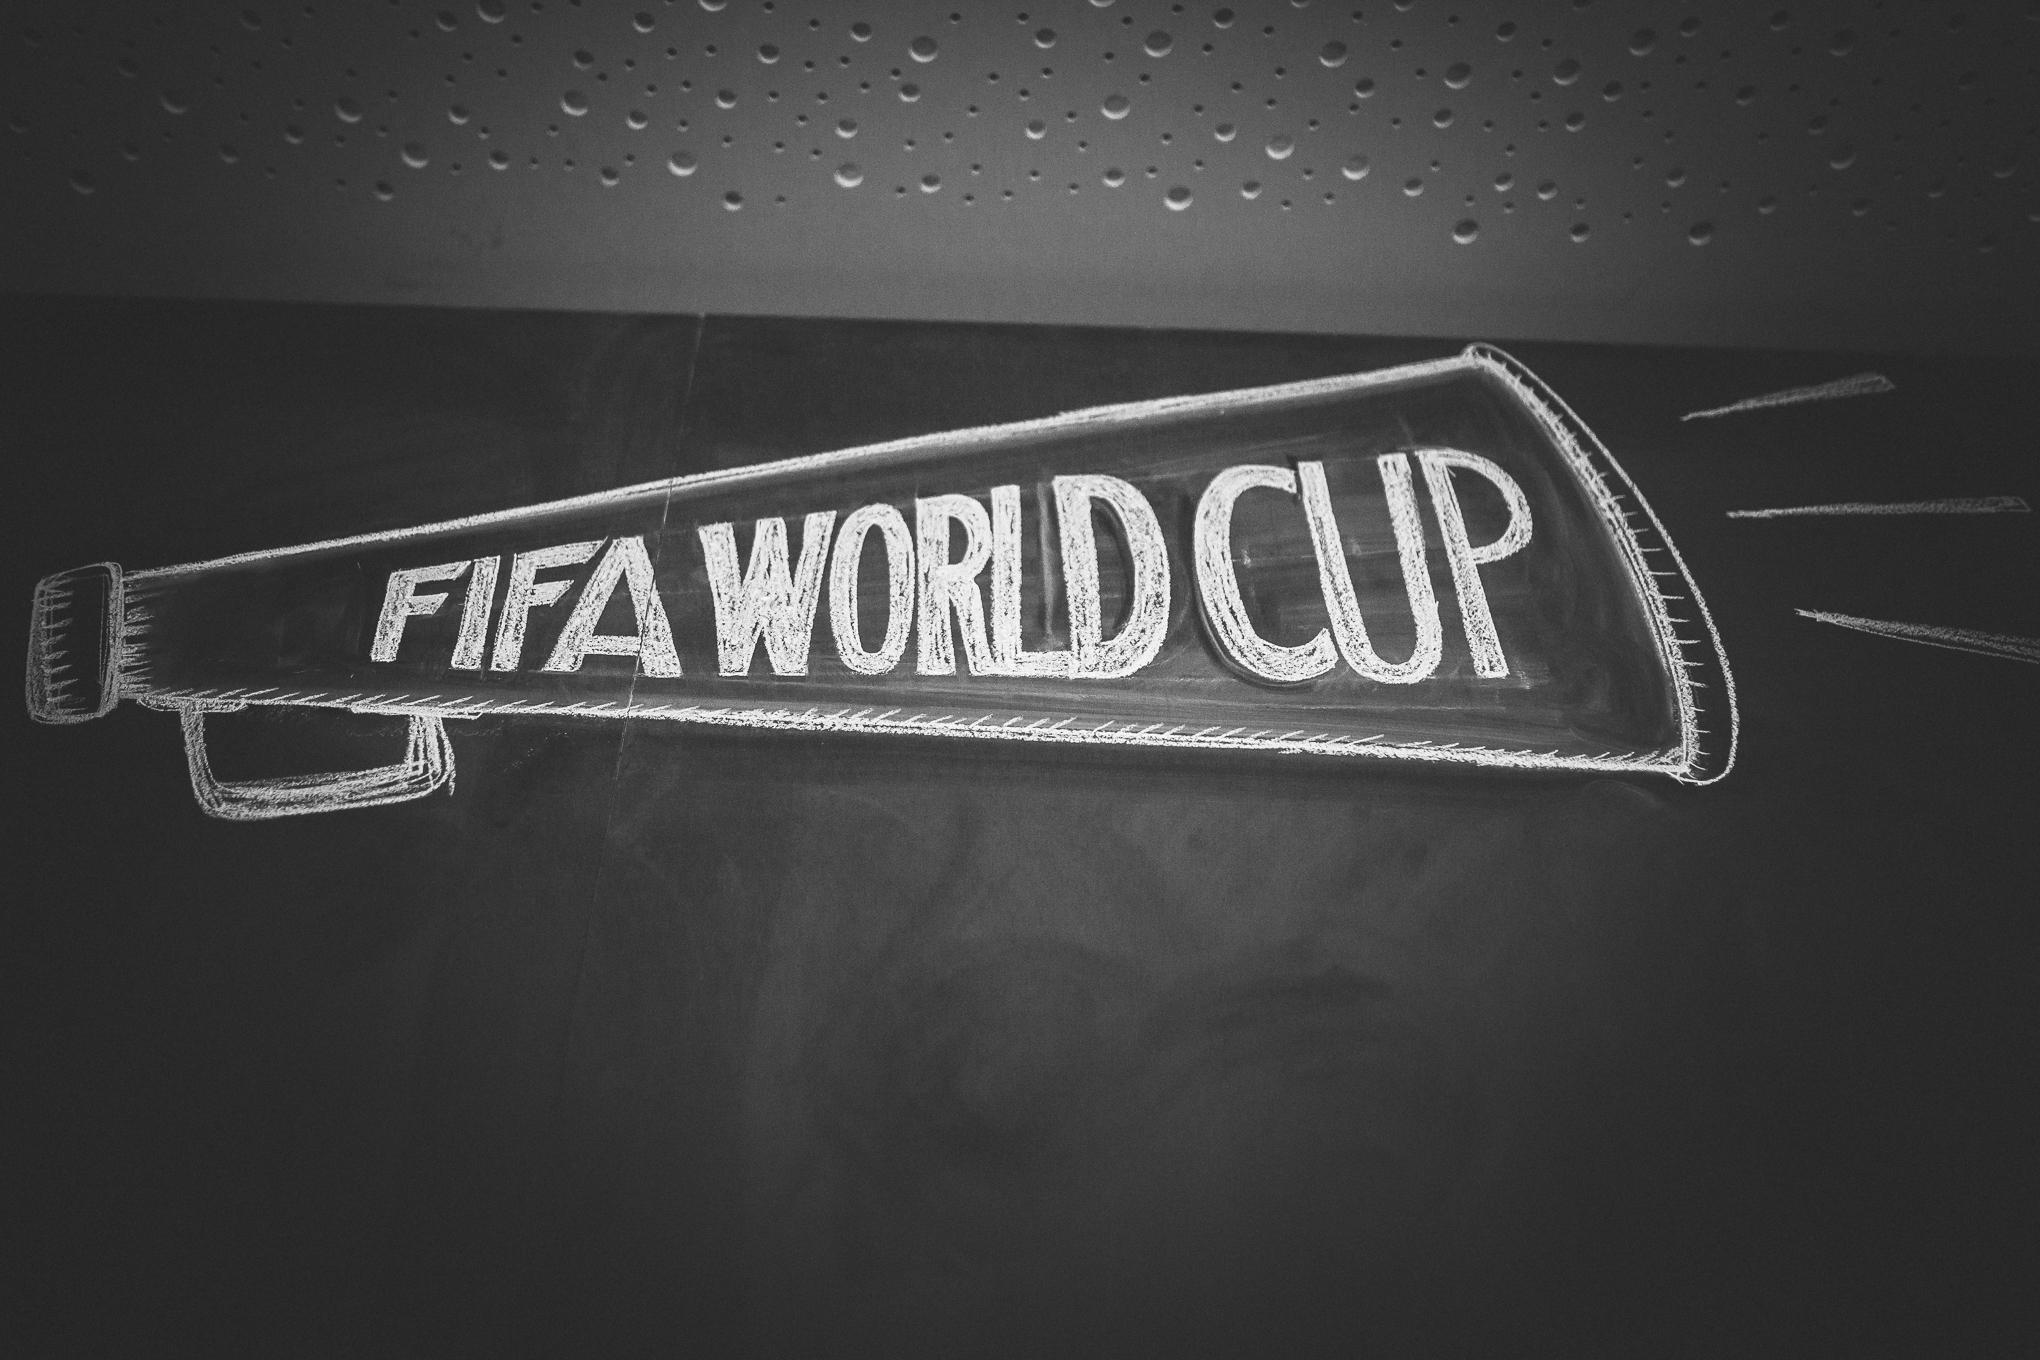 Fifa world cup wm 2018 Swa tafel lettering kreide chalklettering illustration emma mendel